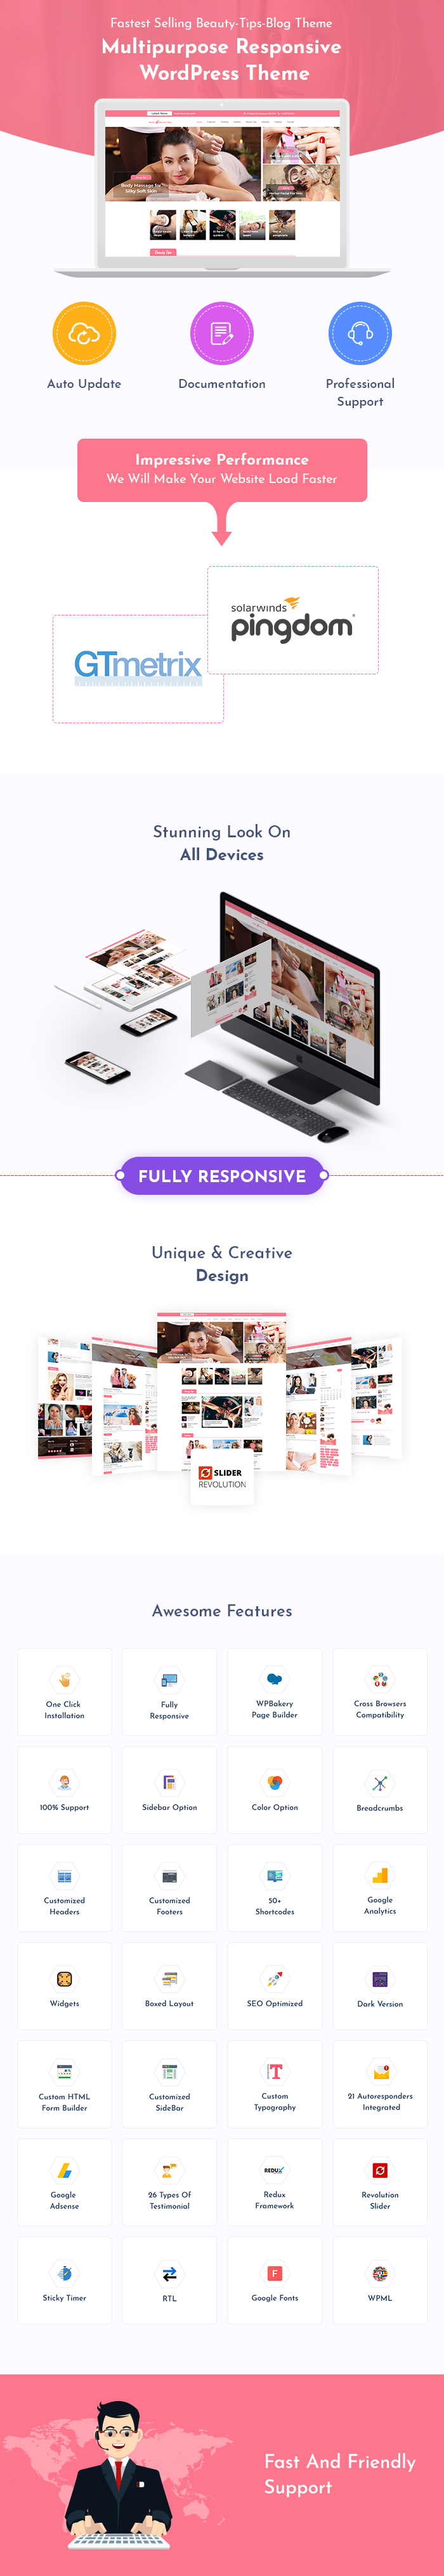 Beauty Tips WordPress Themes